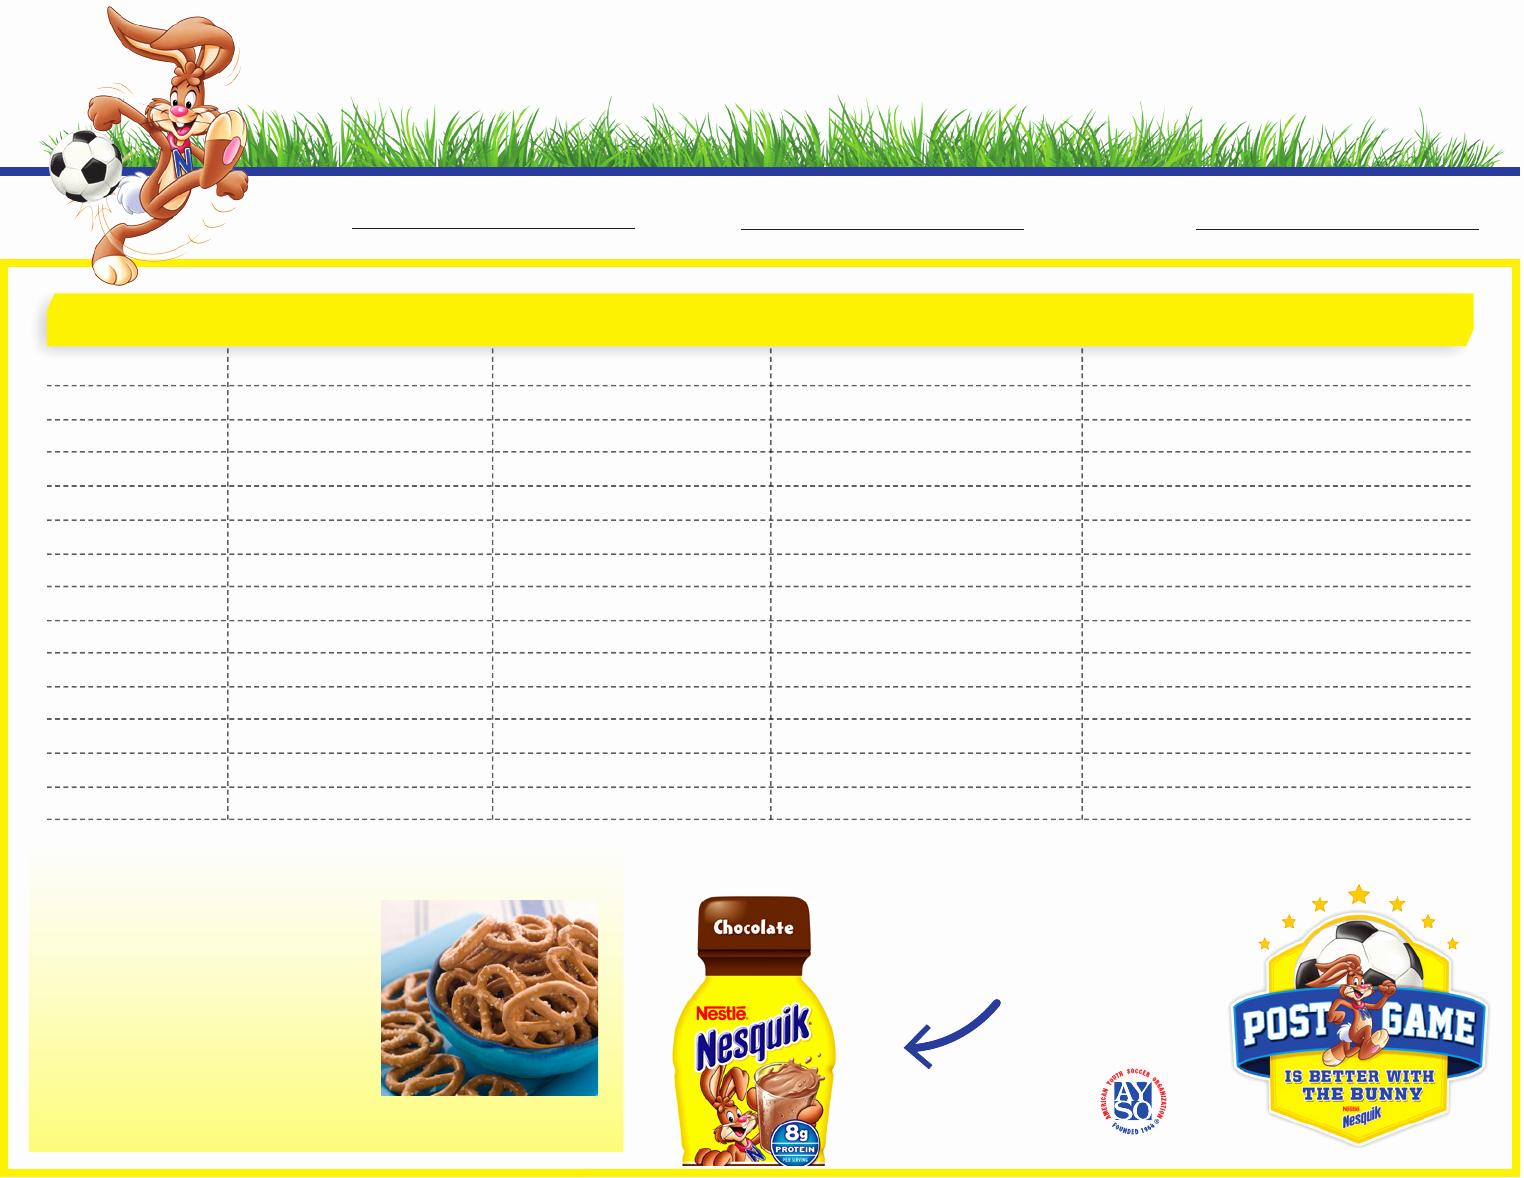 Team Snack Schedule Template Beautiful Download Team Snack Schedule Template for Free formtemplate